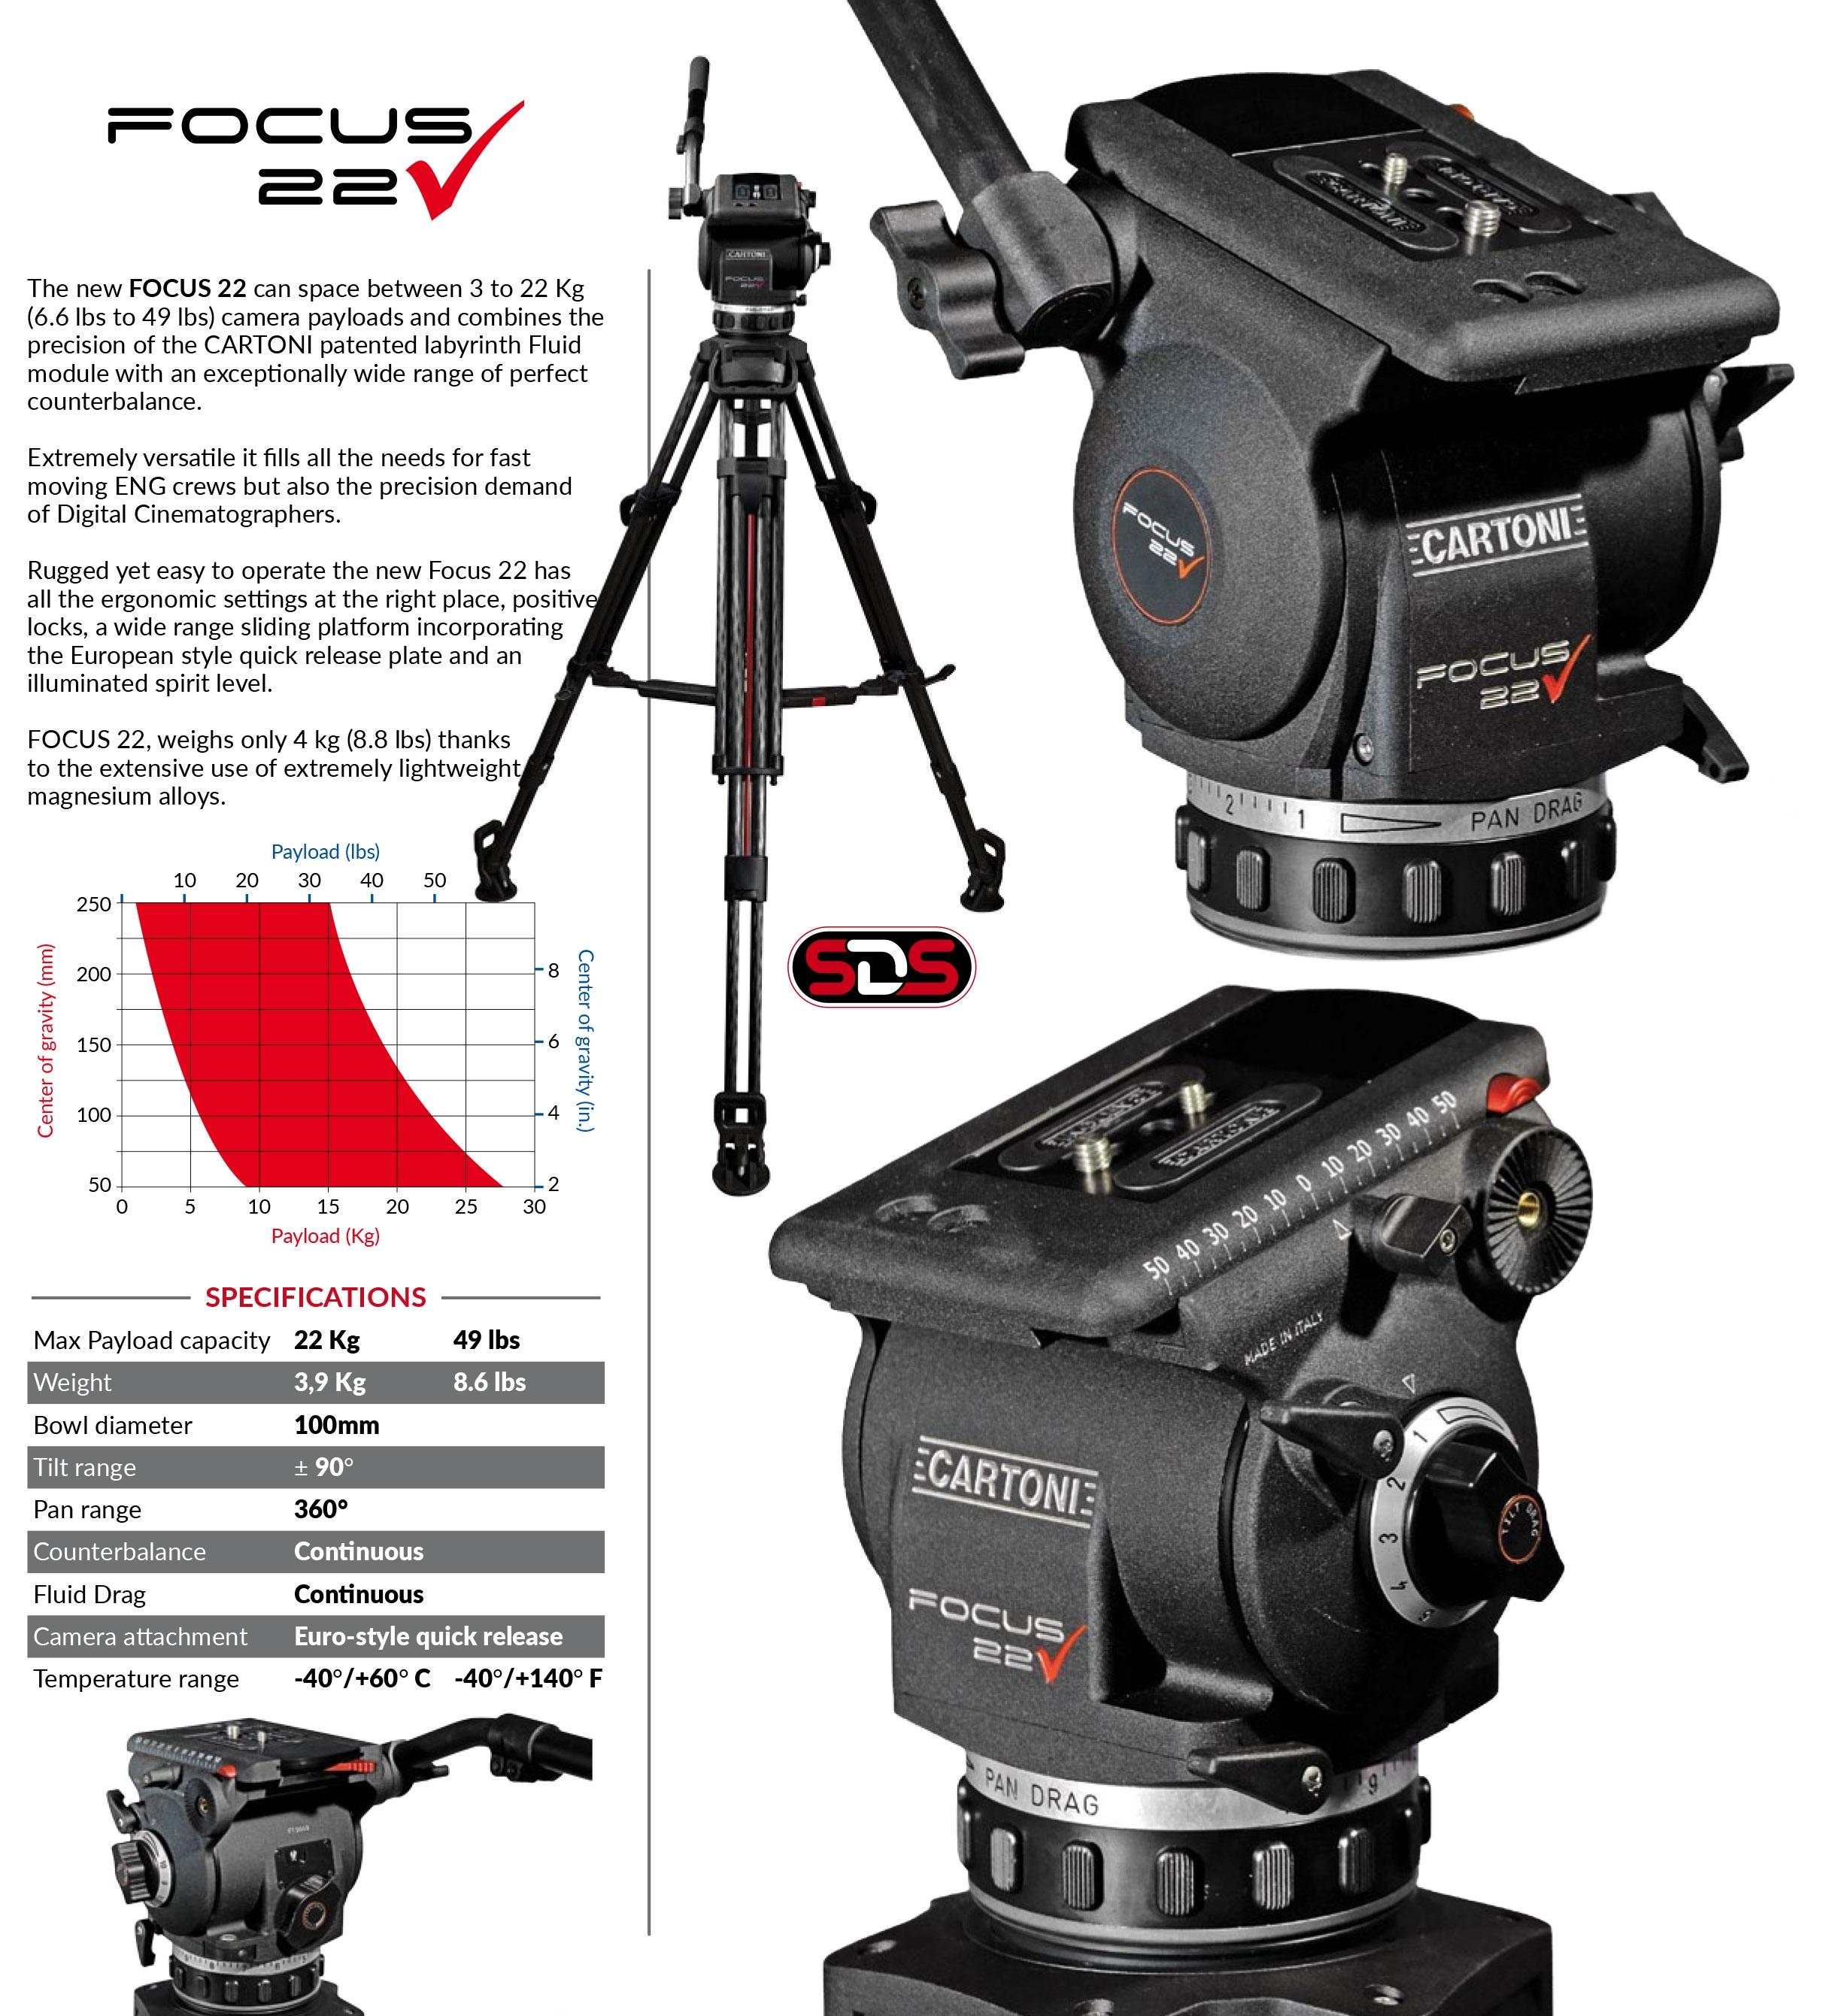 focus 22 overview